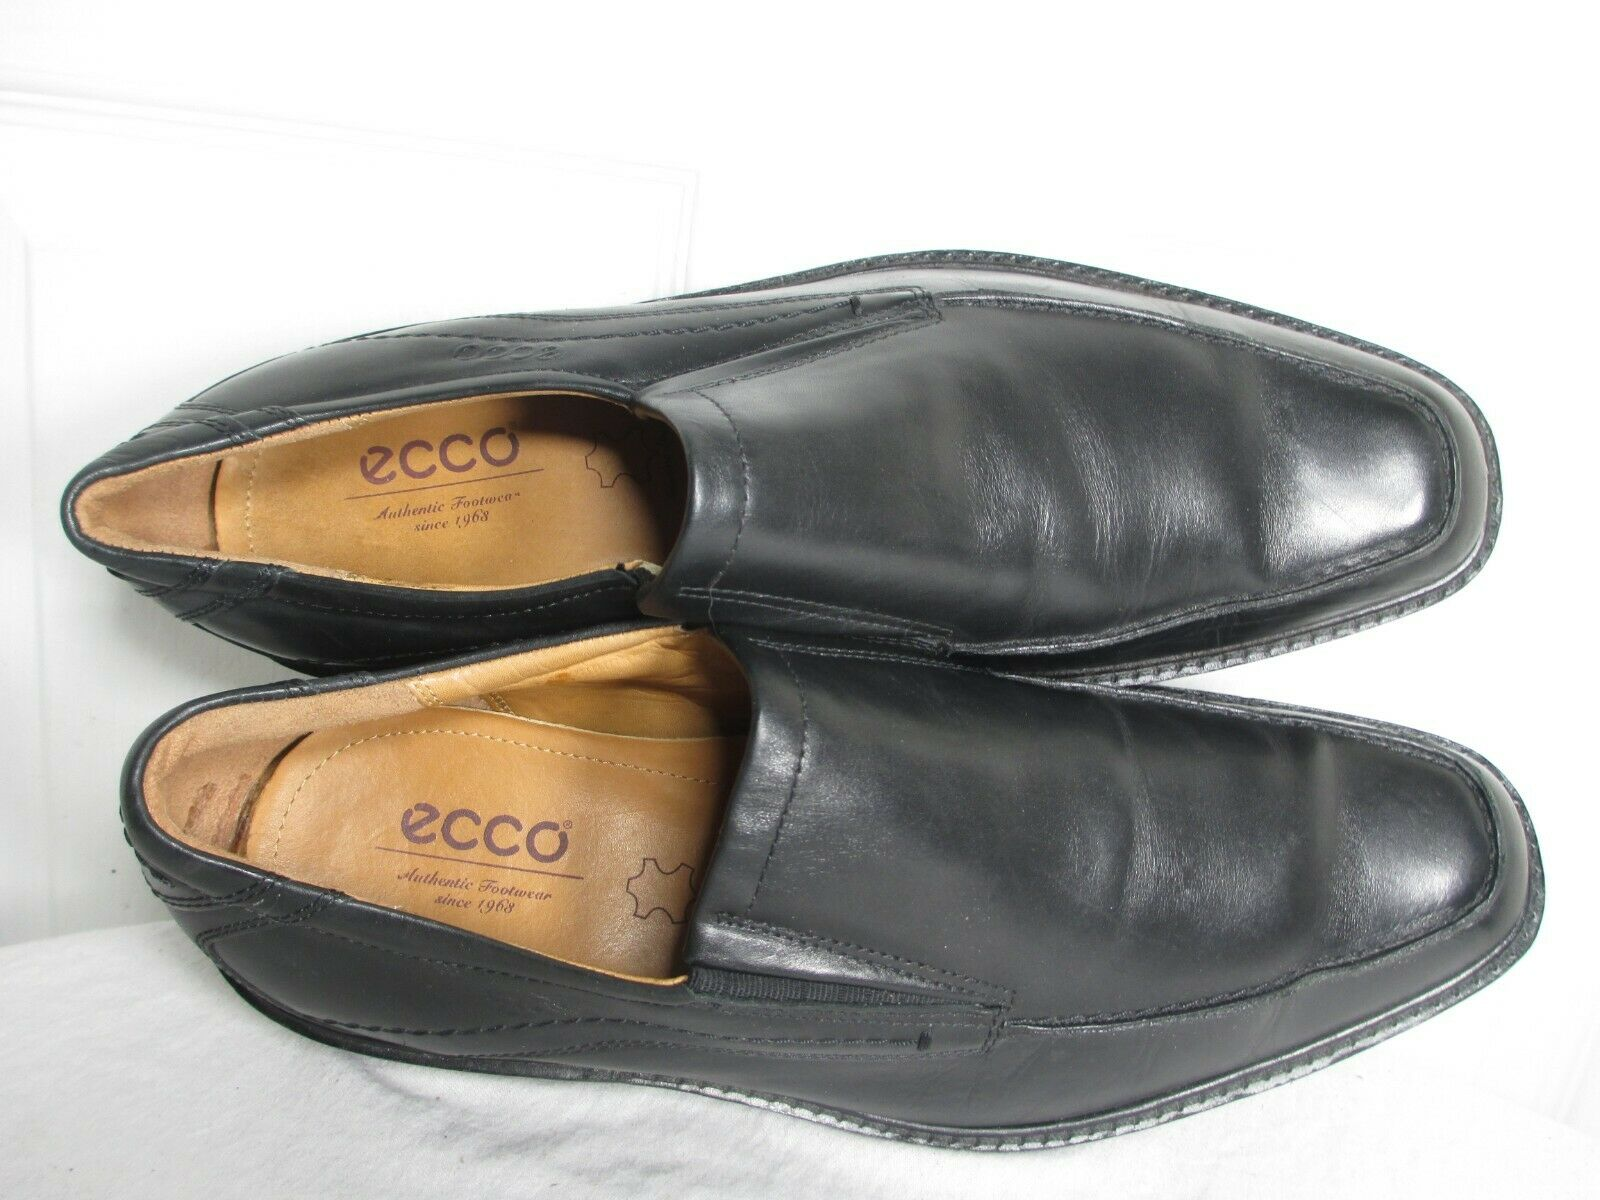 ECCO ECCO ECCO MEN'S HOLTON APRON TOE SLIP ON LOAFERS schwarz Größe EU 44 US 11 9e41c8